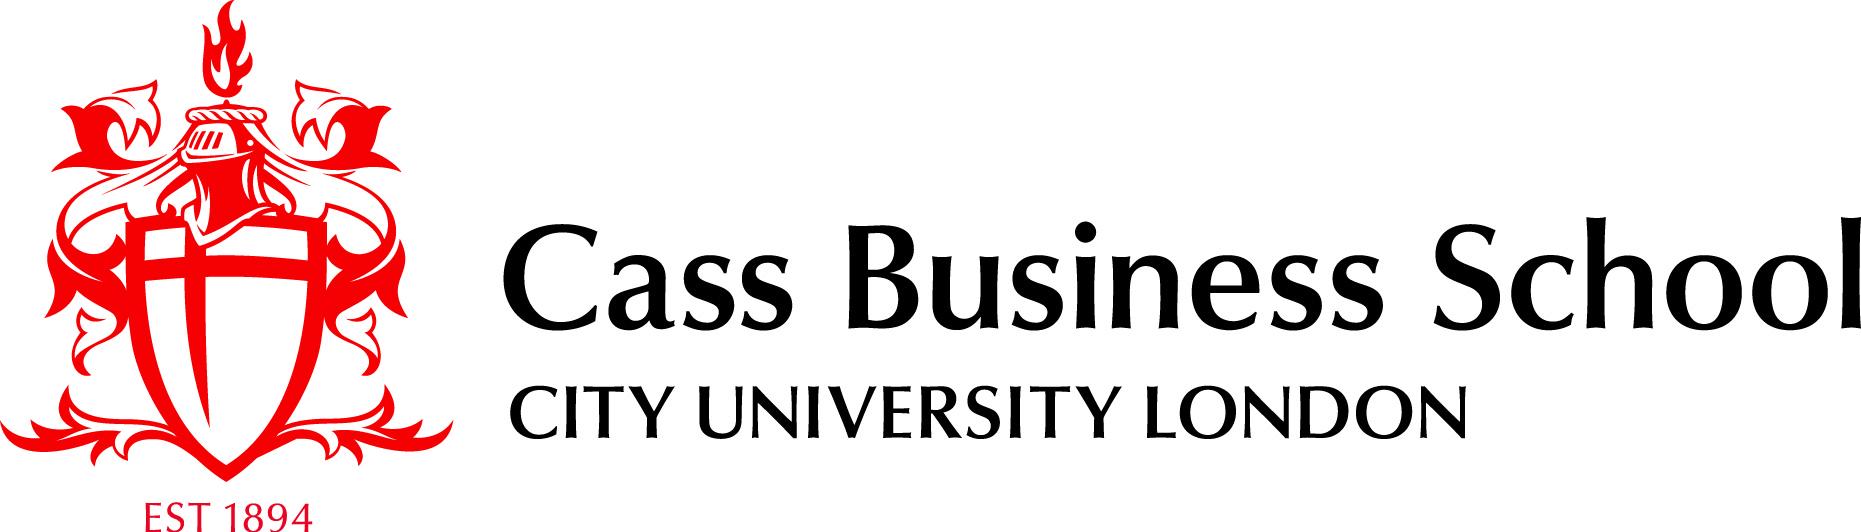 Postgraduate Management Science Degree Courses